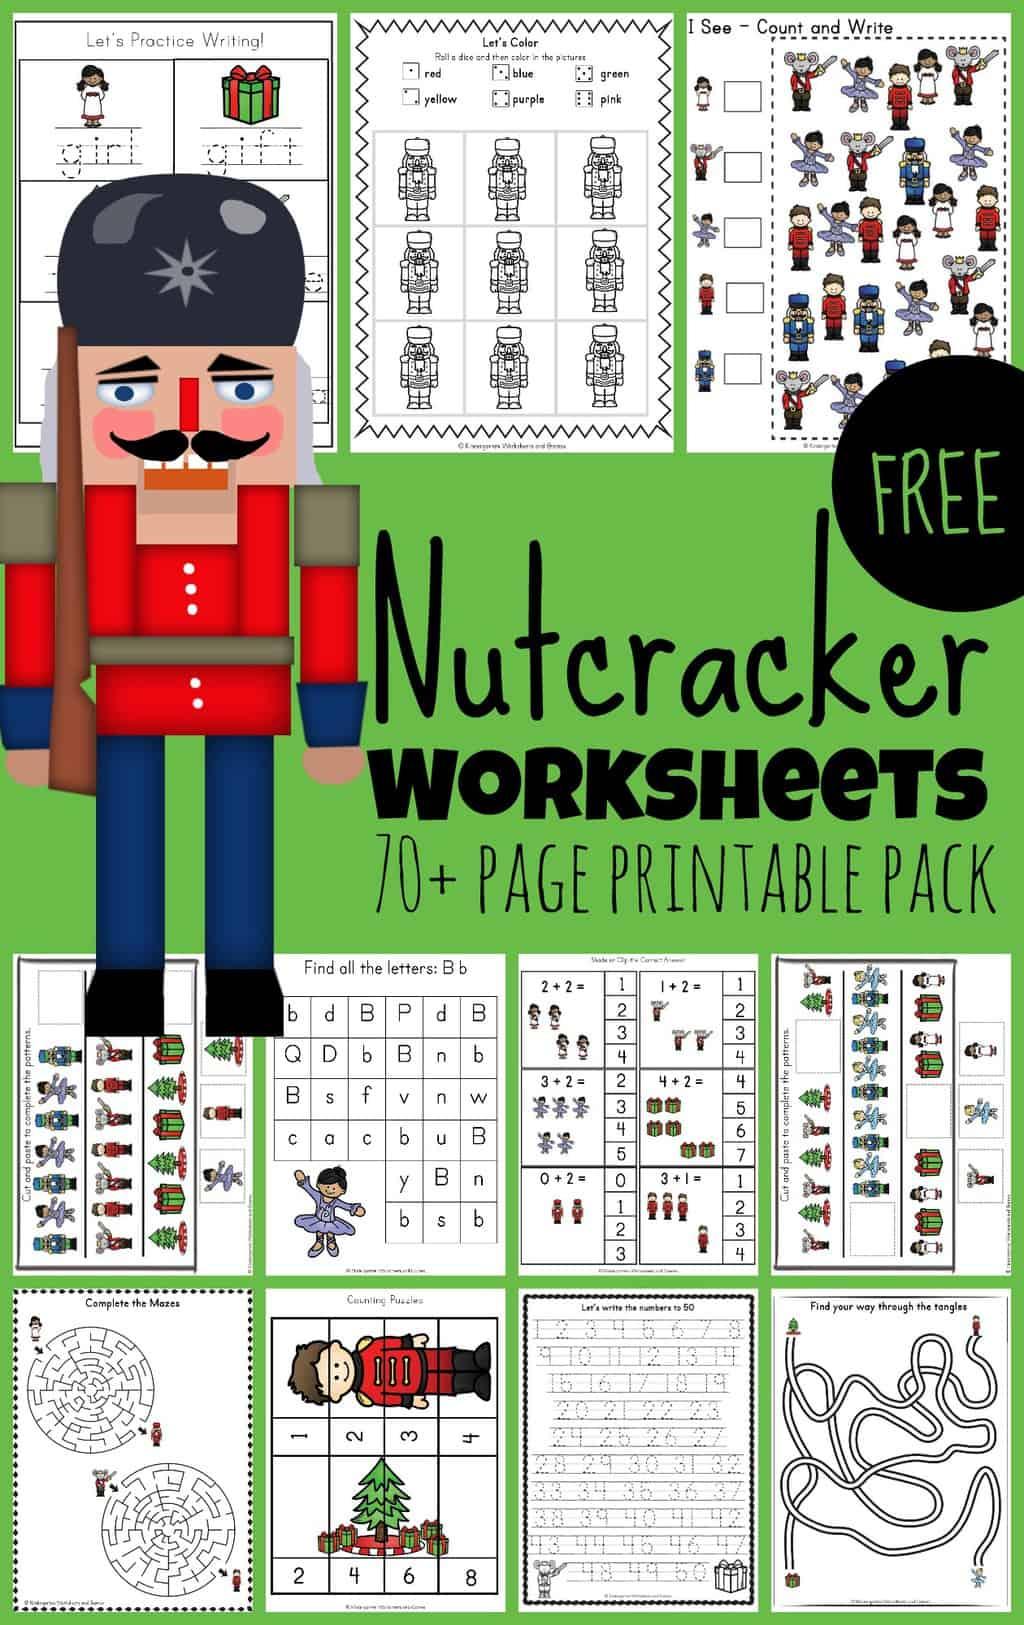 Free Nutcracker Worksheets Printables Pack